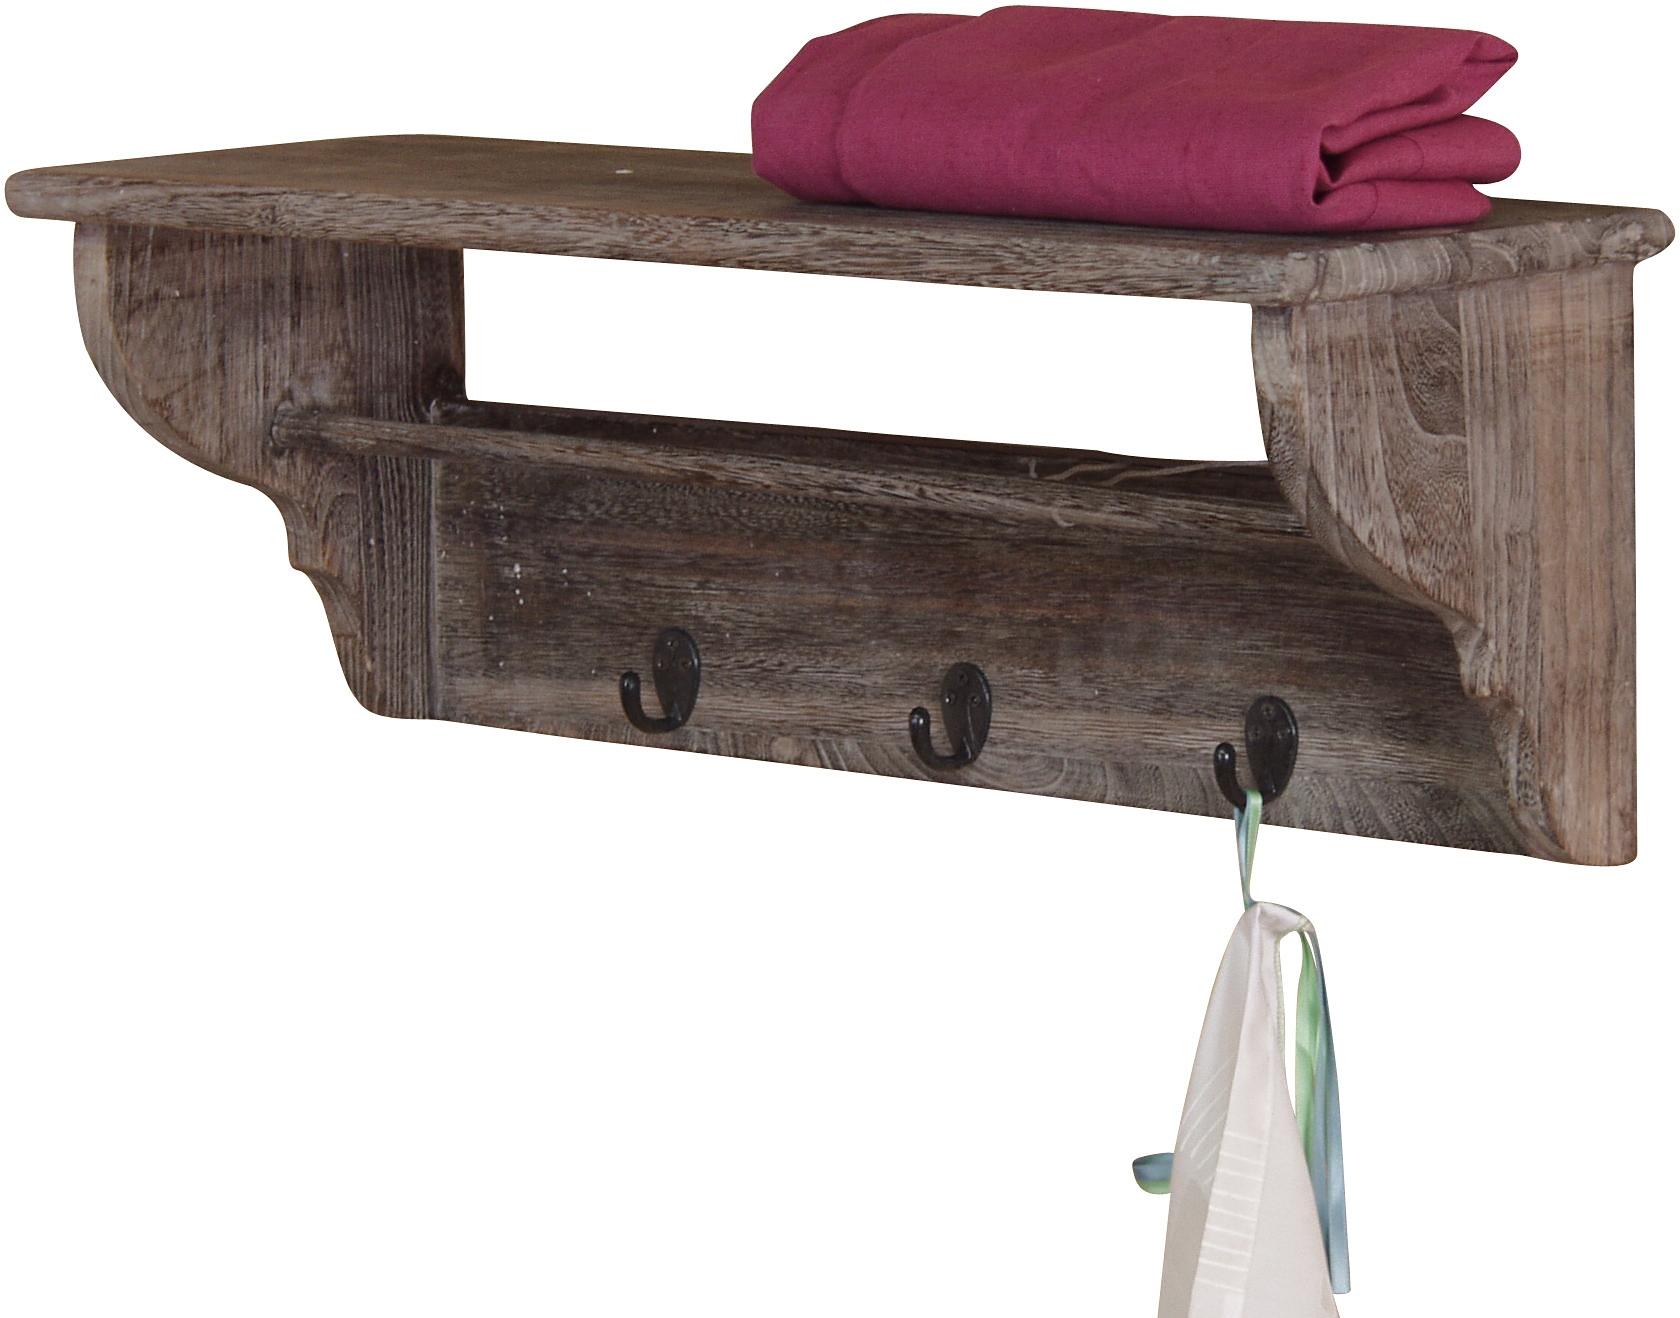 wandkapstok home affaire makkelijk gevonden otto. Black Bedroom Furniture Sets. Home Design Ideas